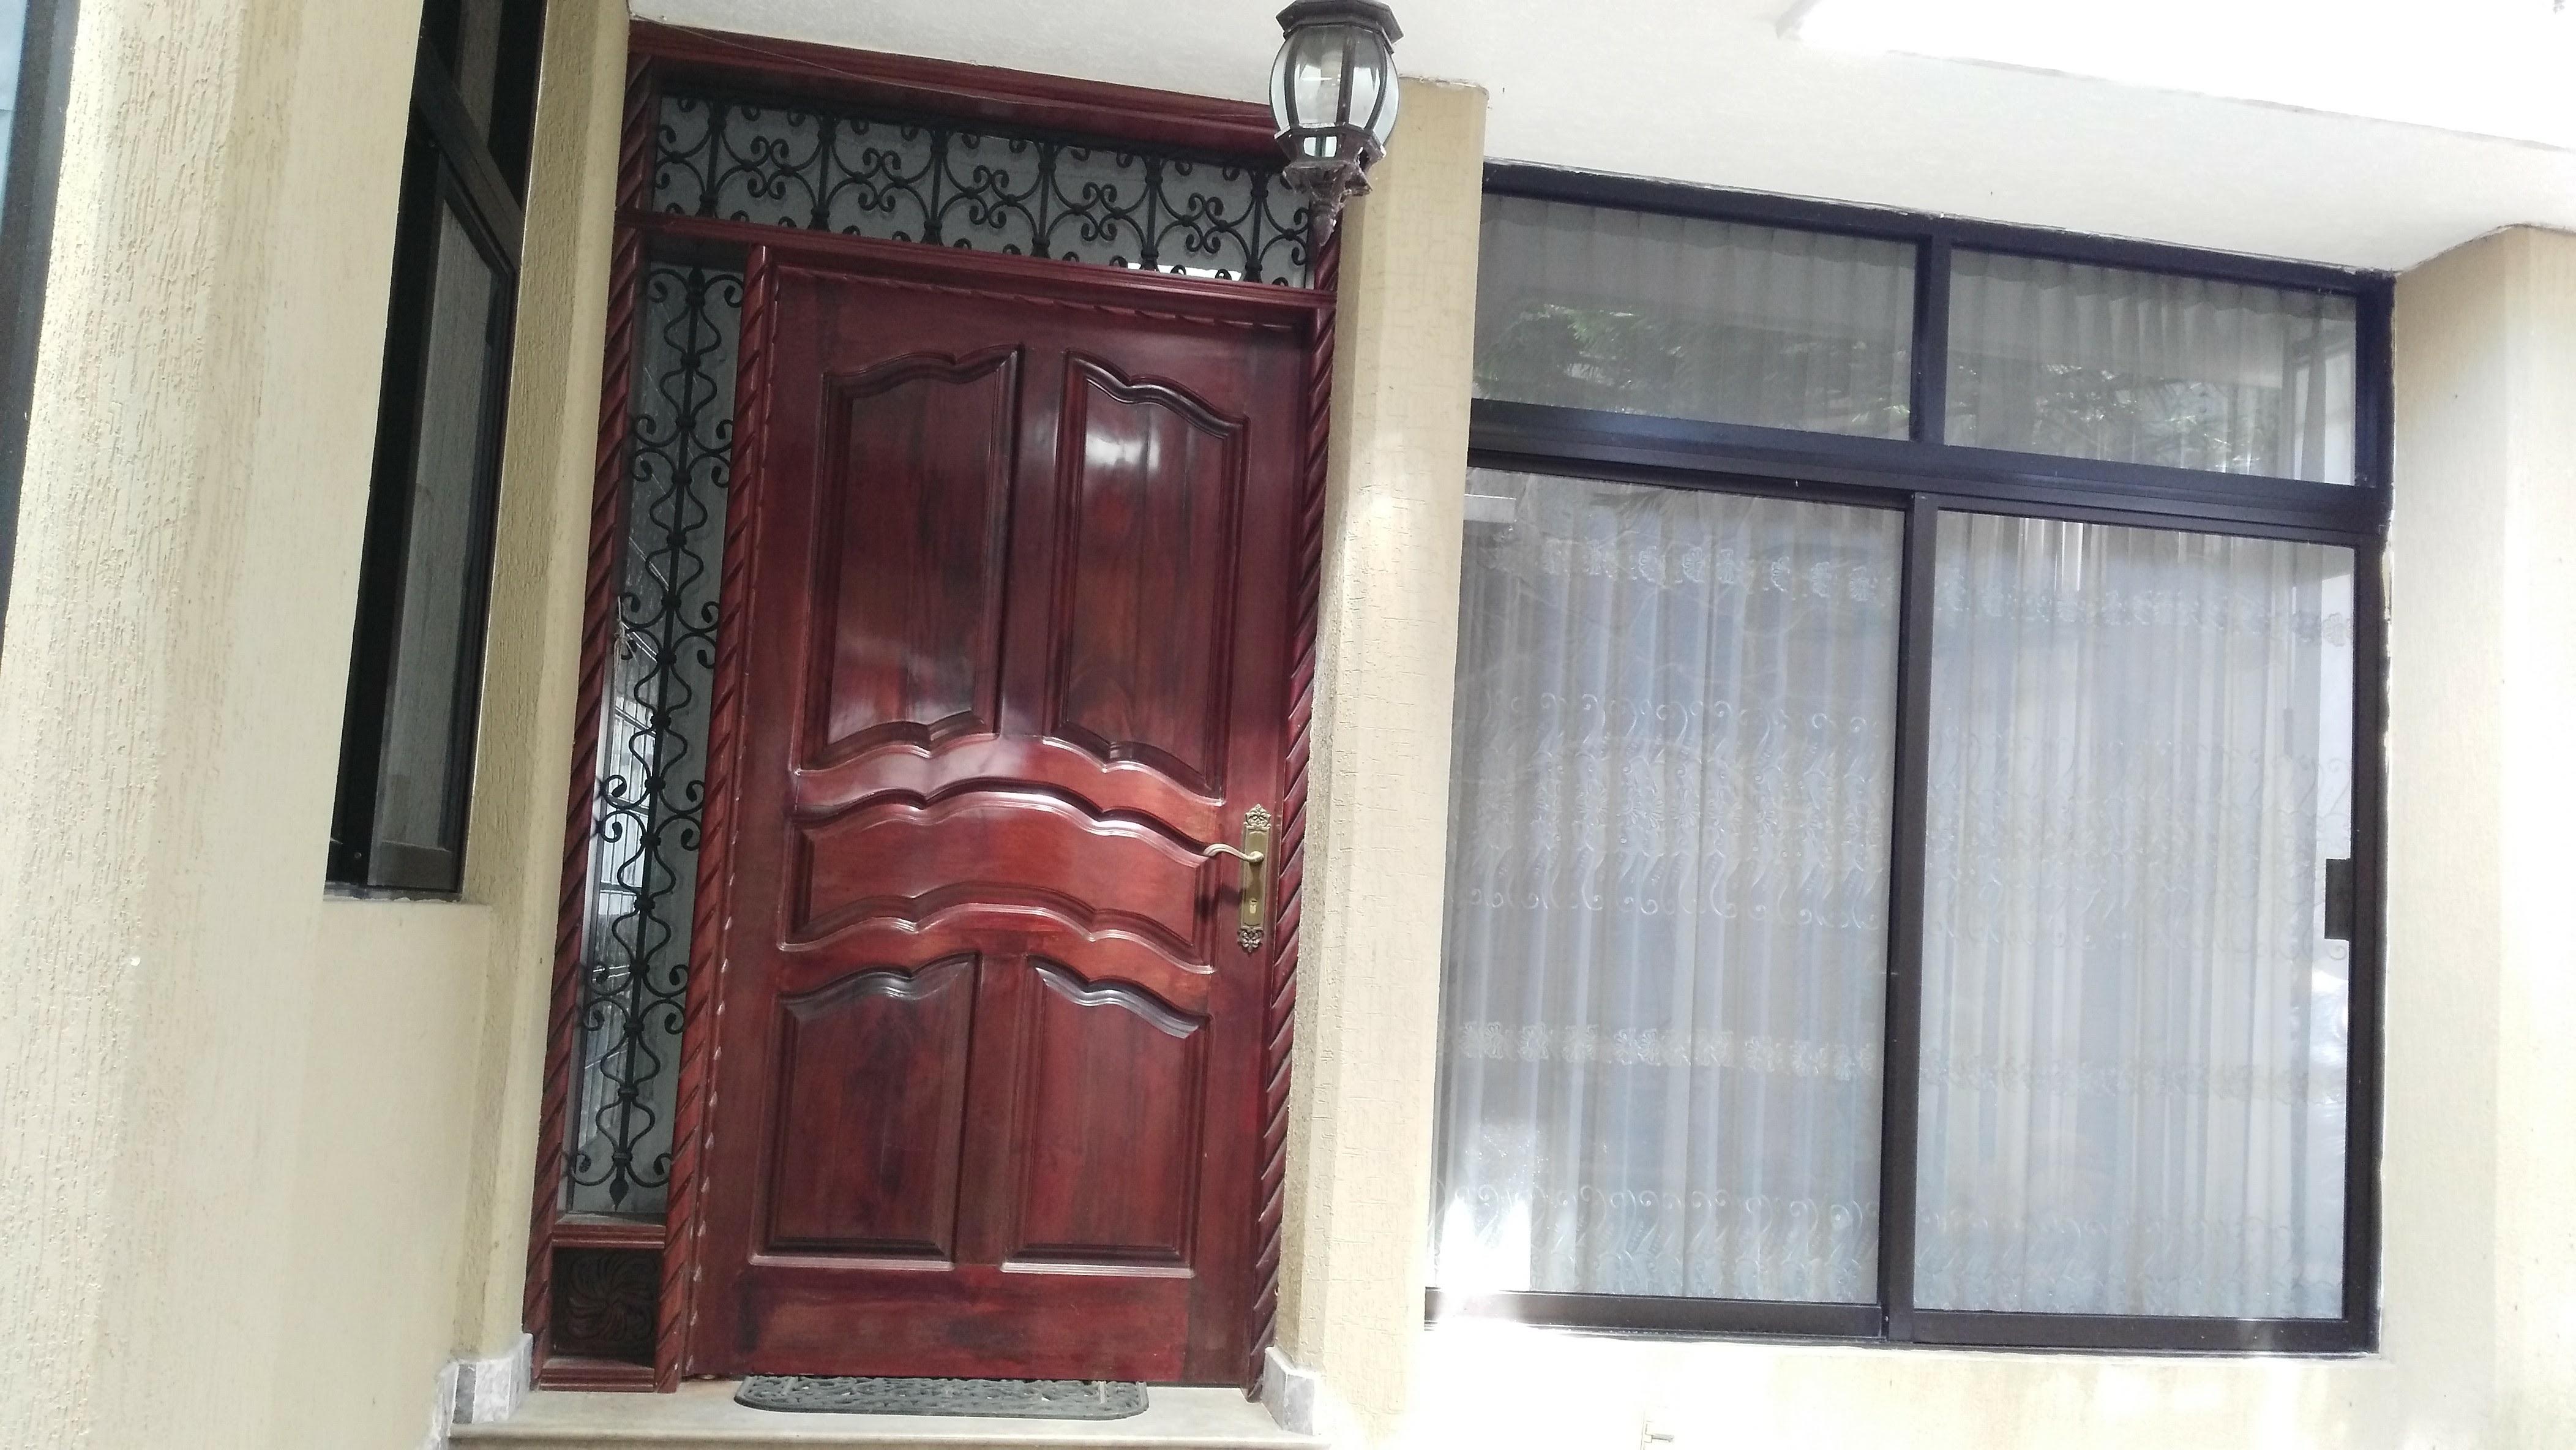 Casa Amueblada en Renta en Col. Petrolera, Coatzacoalcos, Ver.